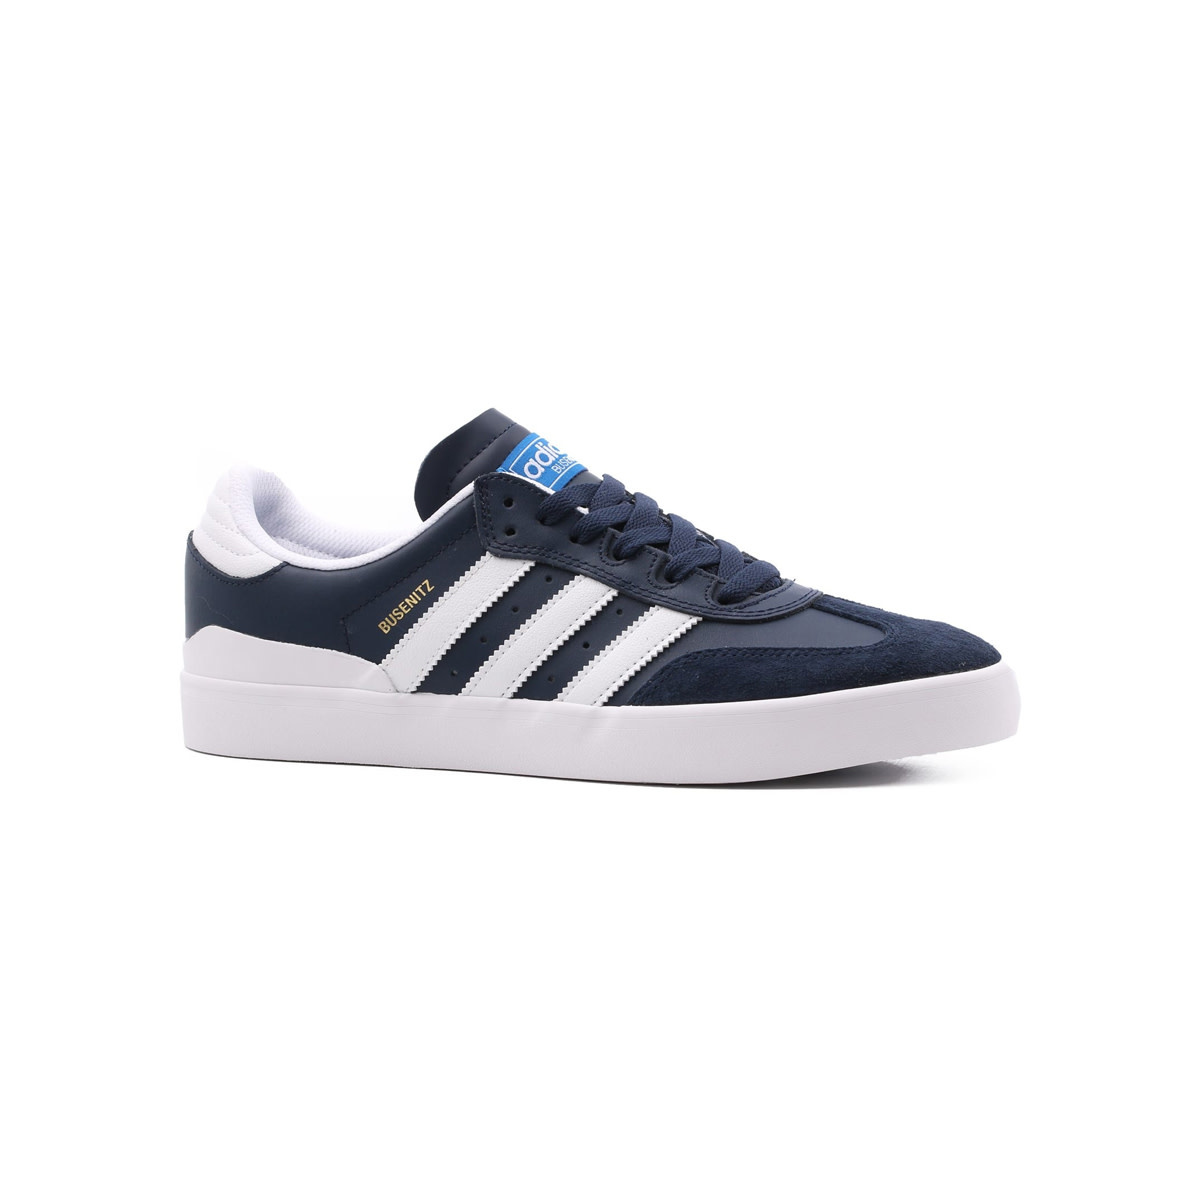 Adidas Skateboarding Busenitz Vulc RX Shoes Footwear